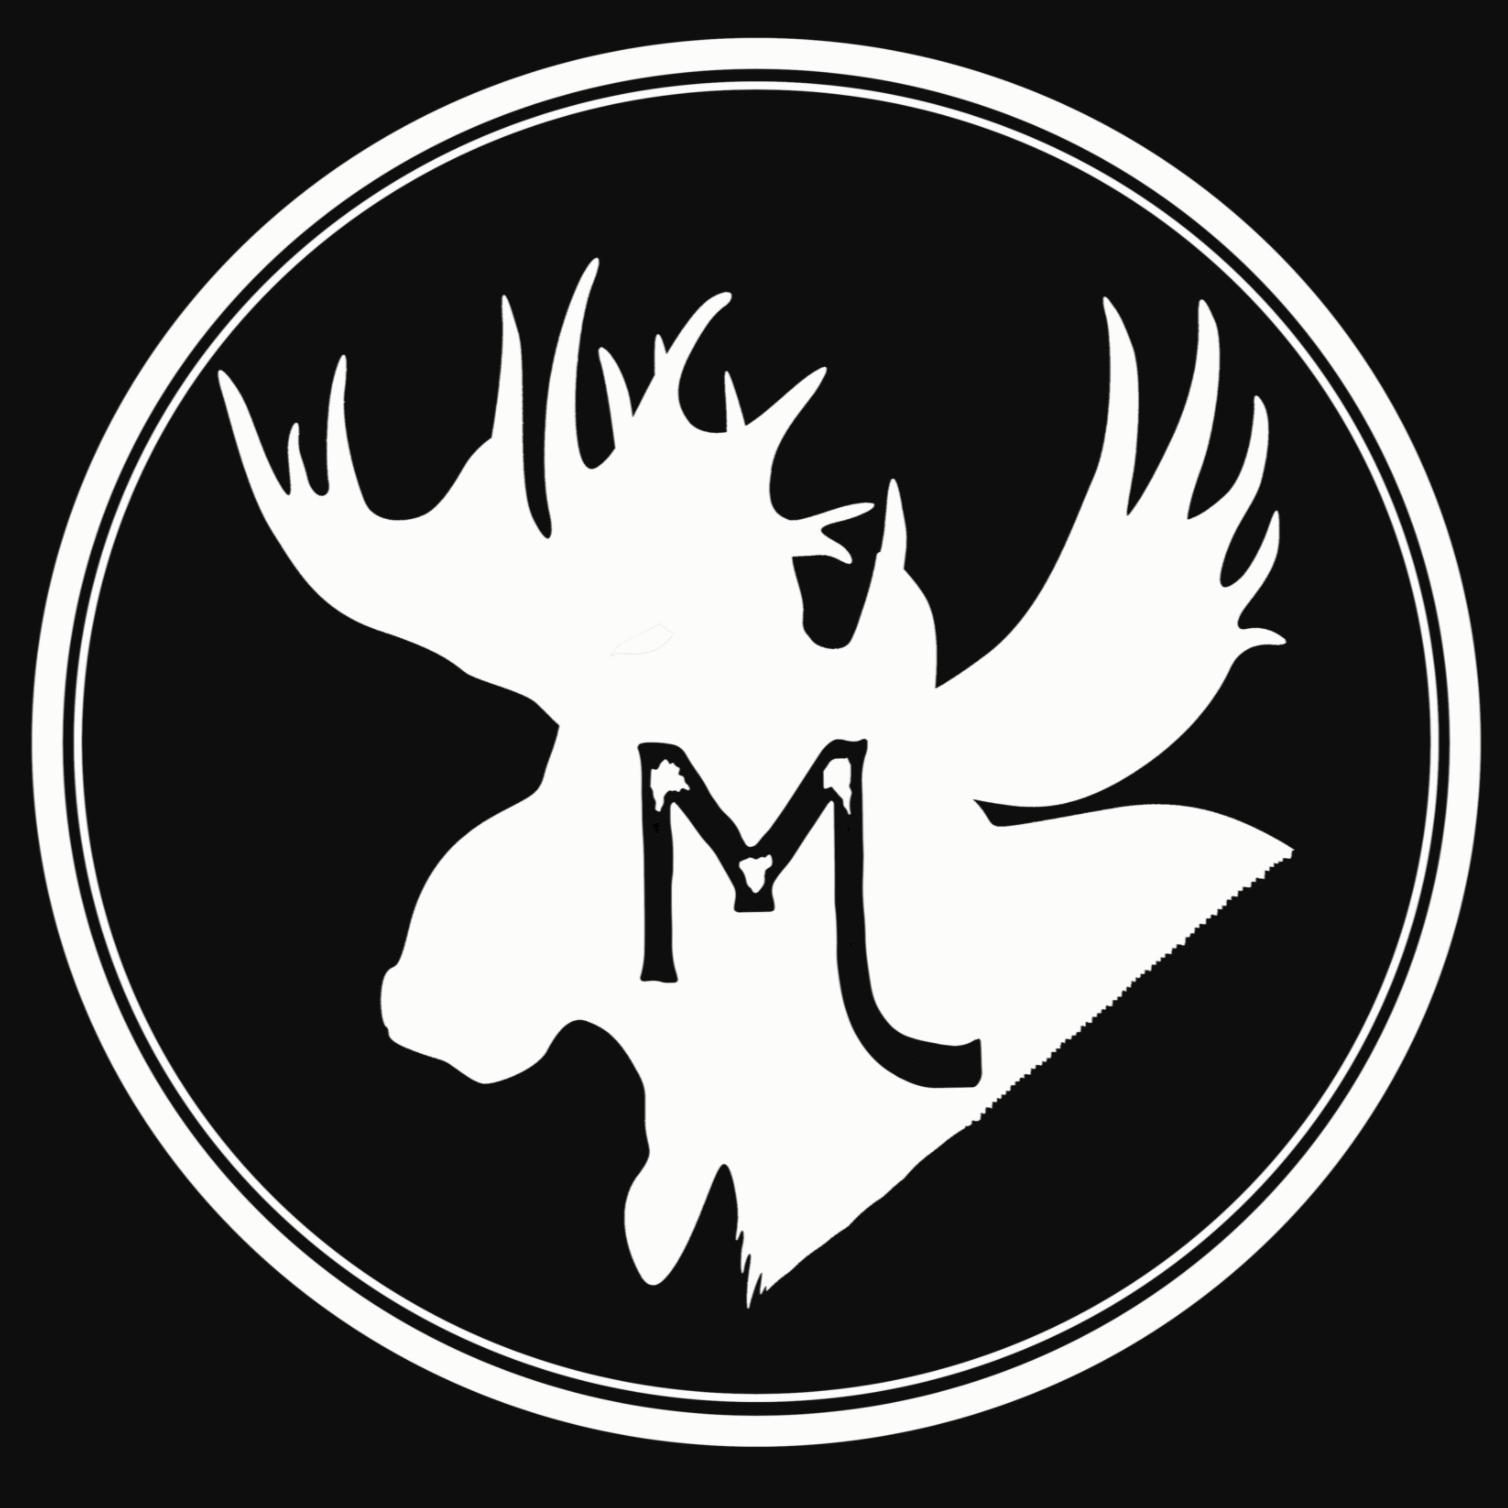 Moose Mountain Goods